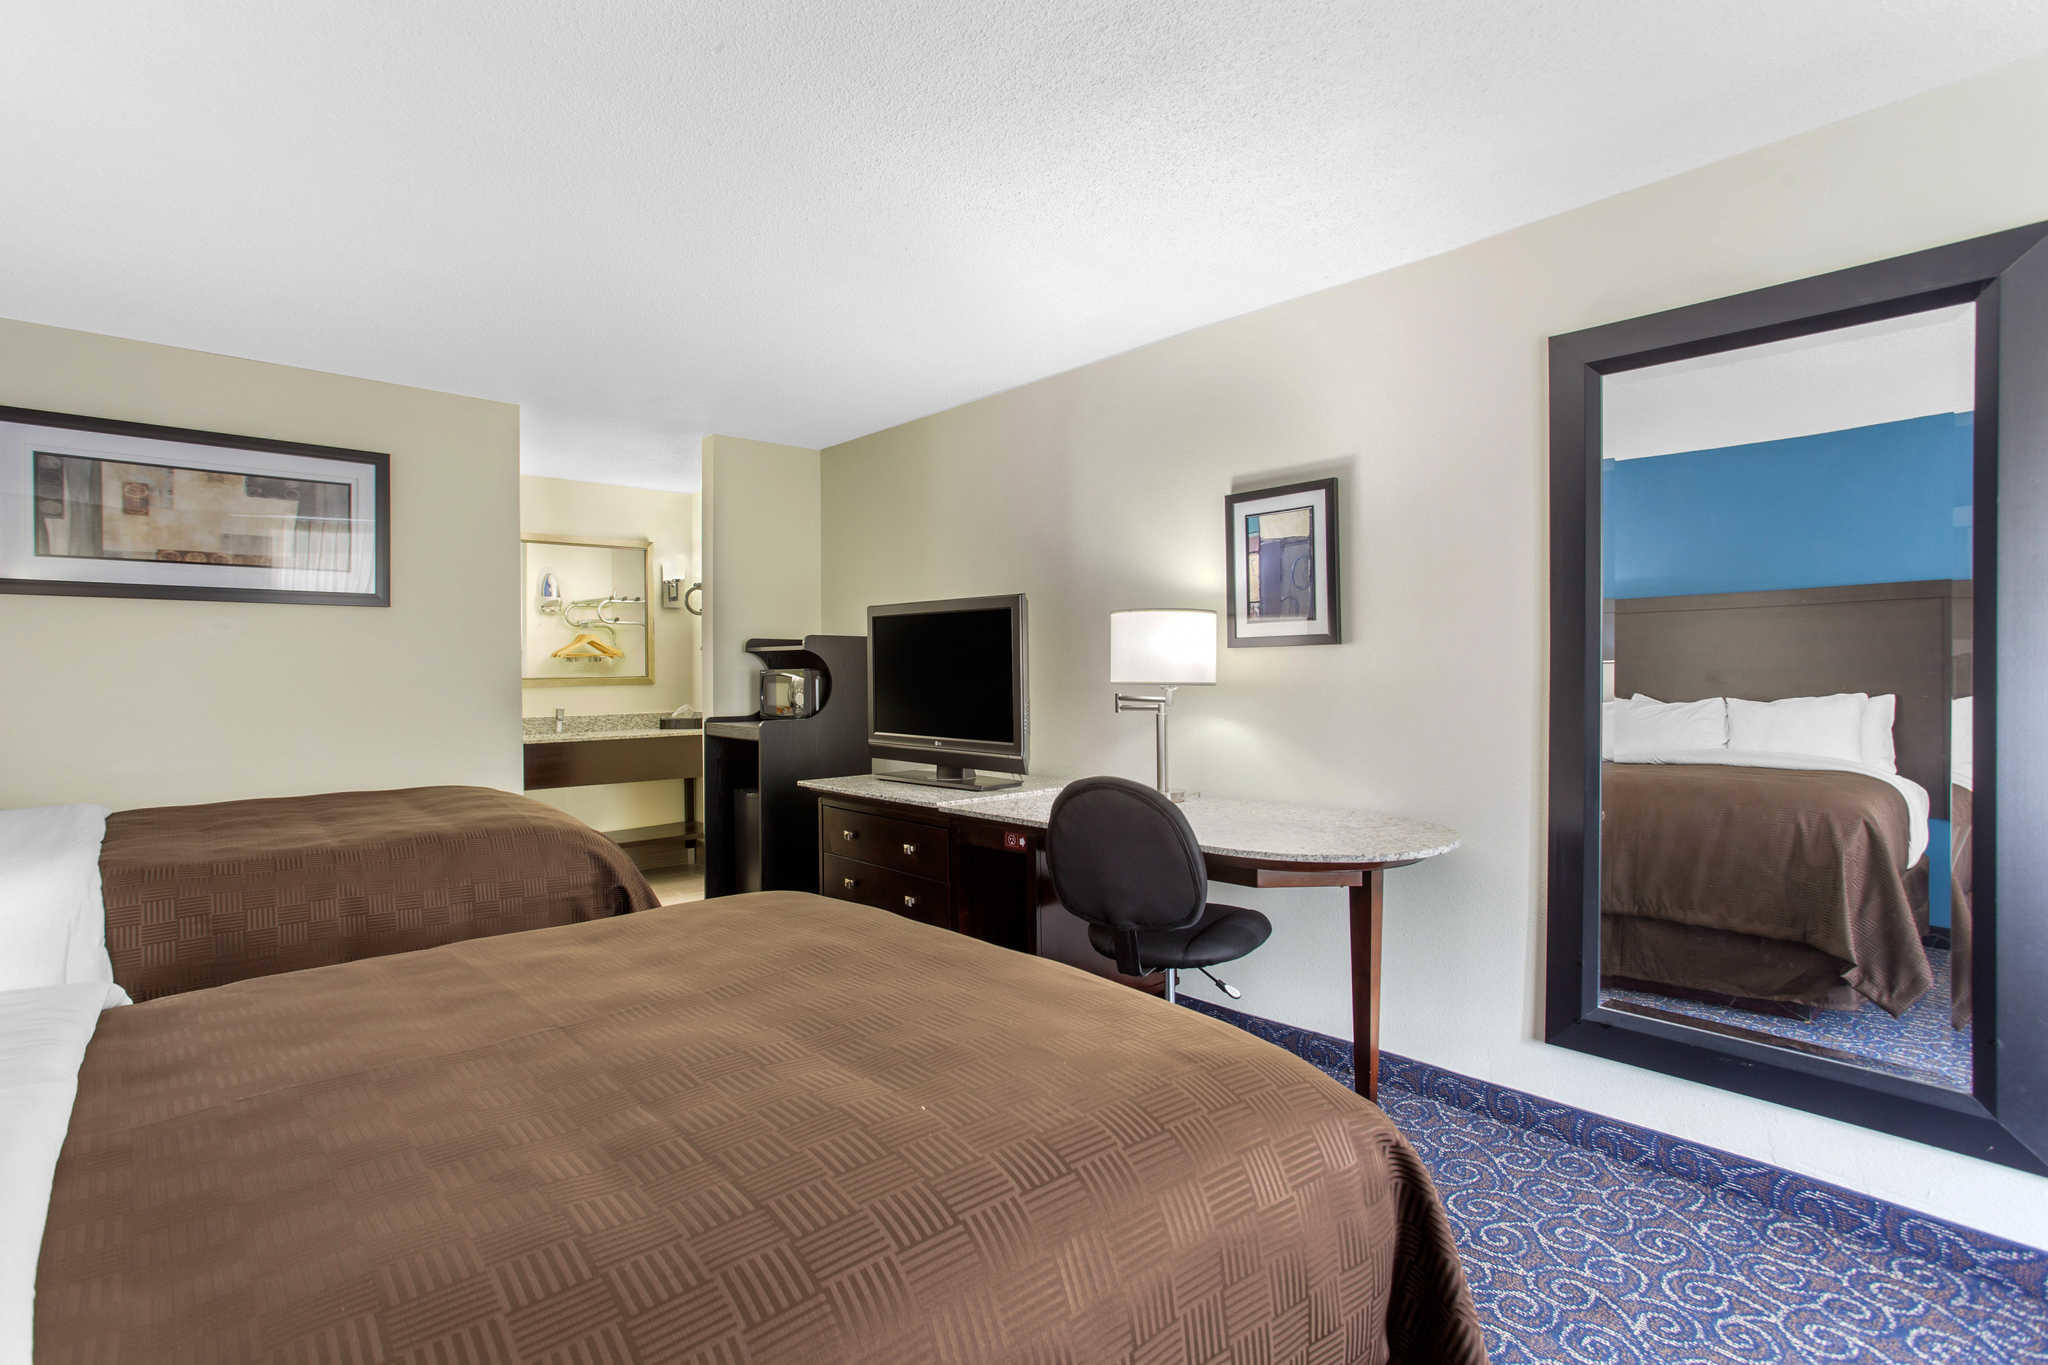 Clarion Inn & Suites image 9